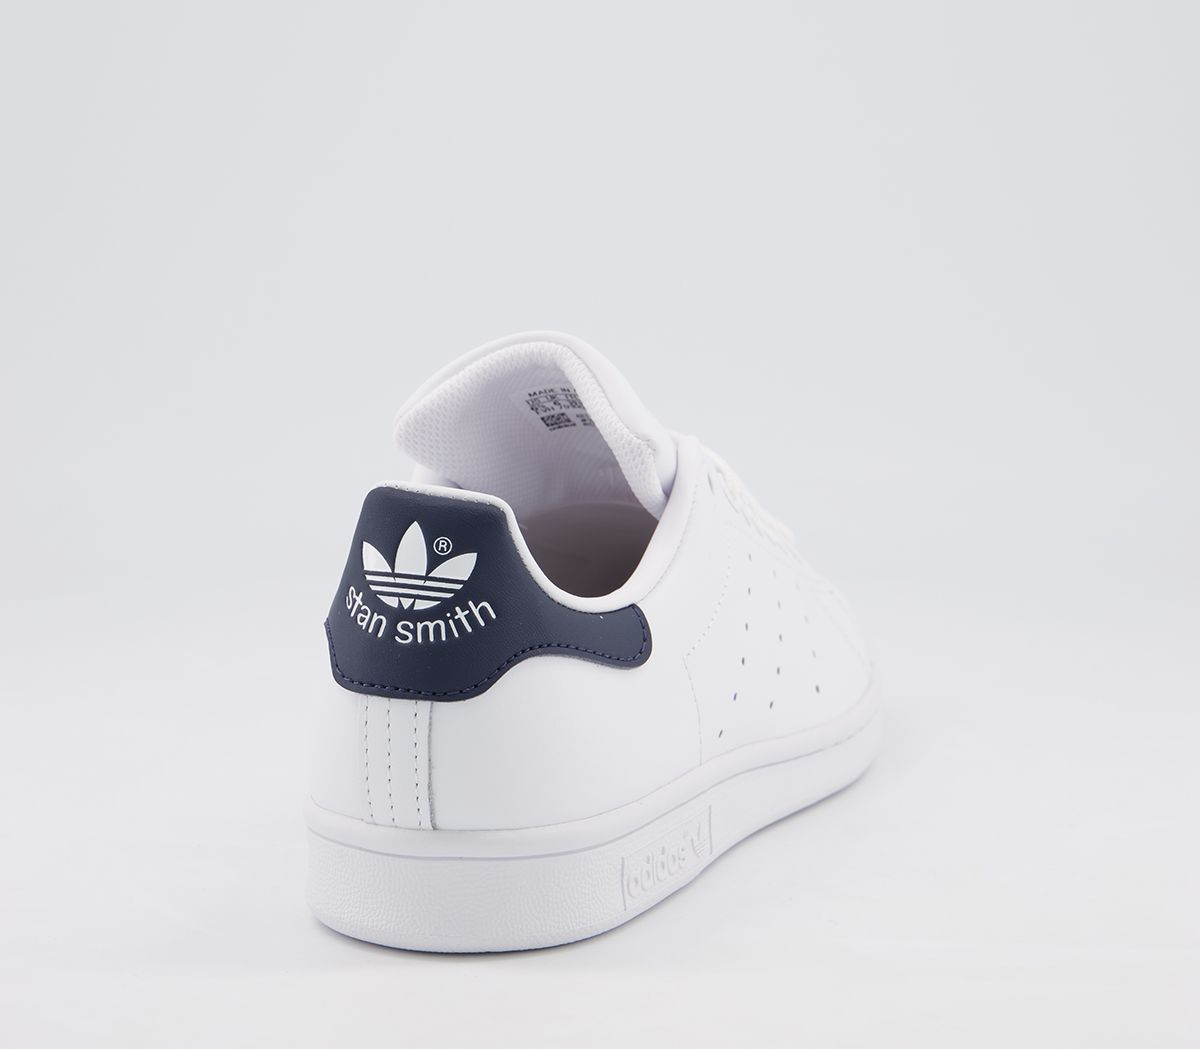 huge discount f708a 6edcd Uomo-Adidas-Stan-Smith-Scarpe-Sportive-Core-Bianco-